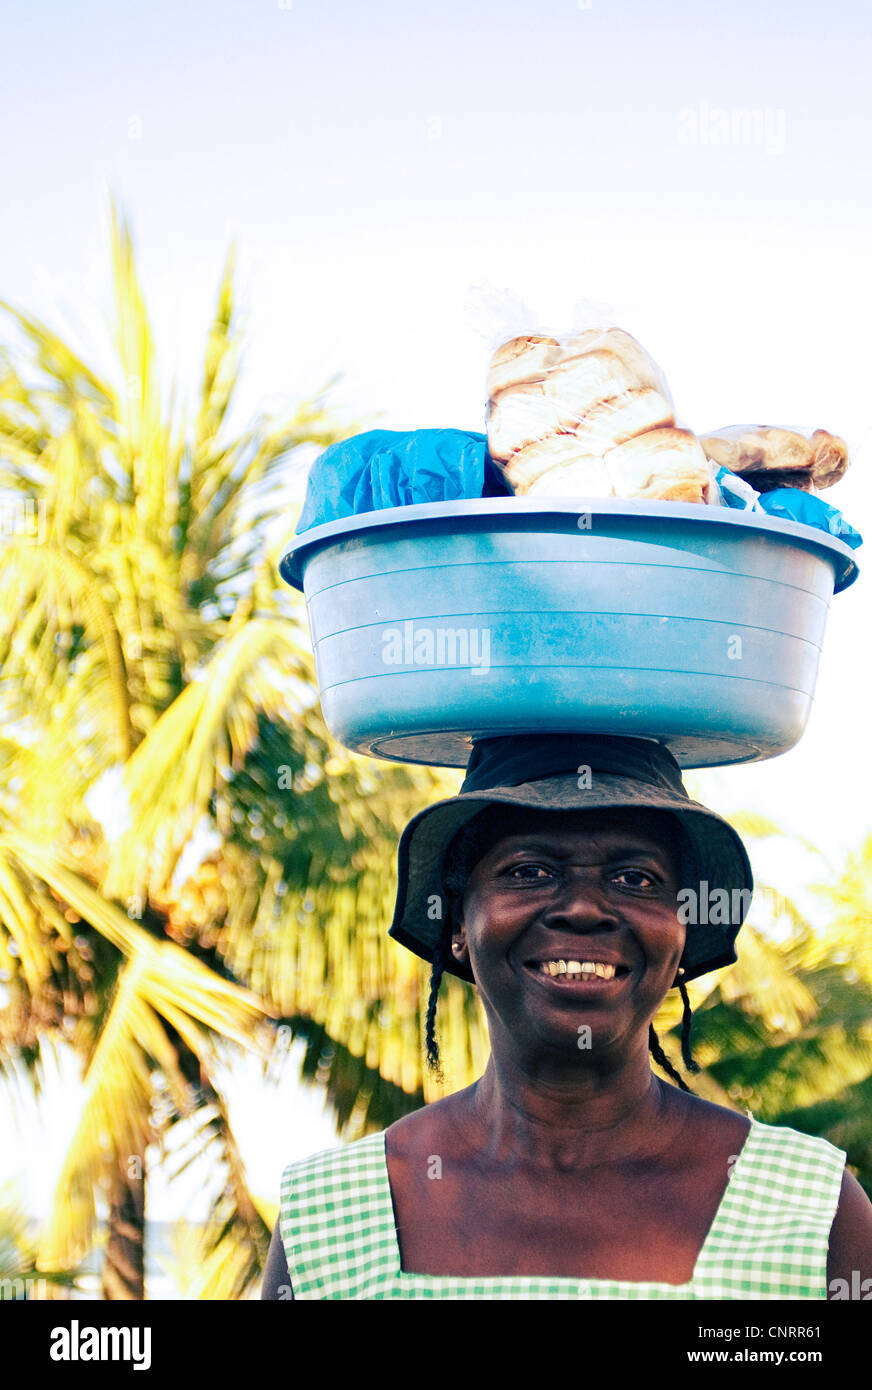 Pan de coco proveedor en Tela, Honduras. Imagen De Stock